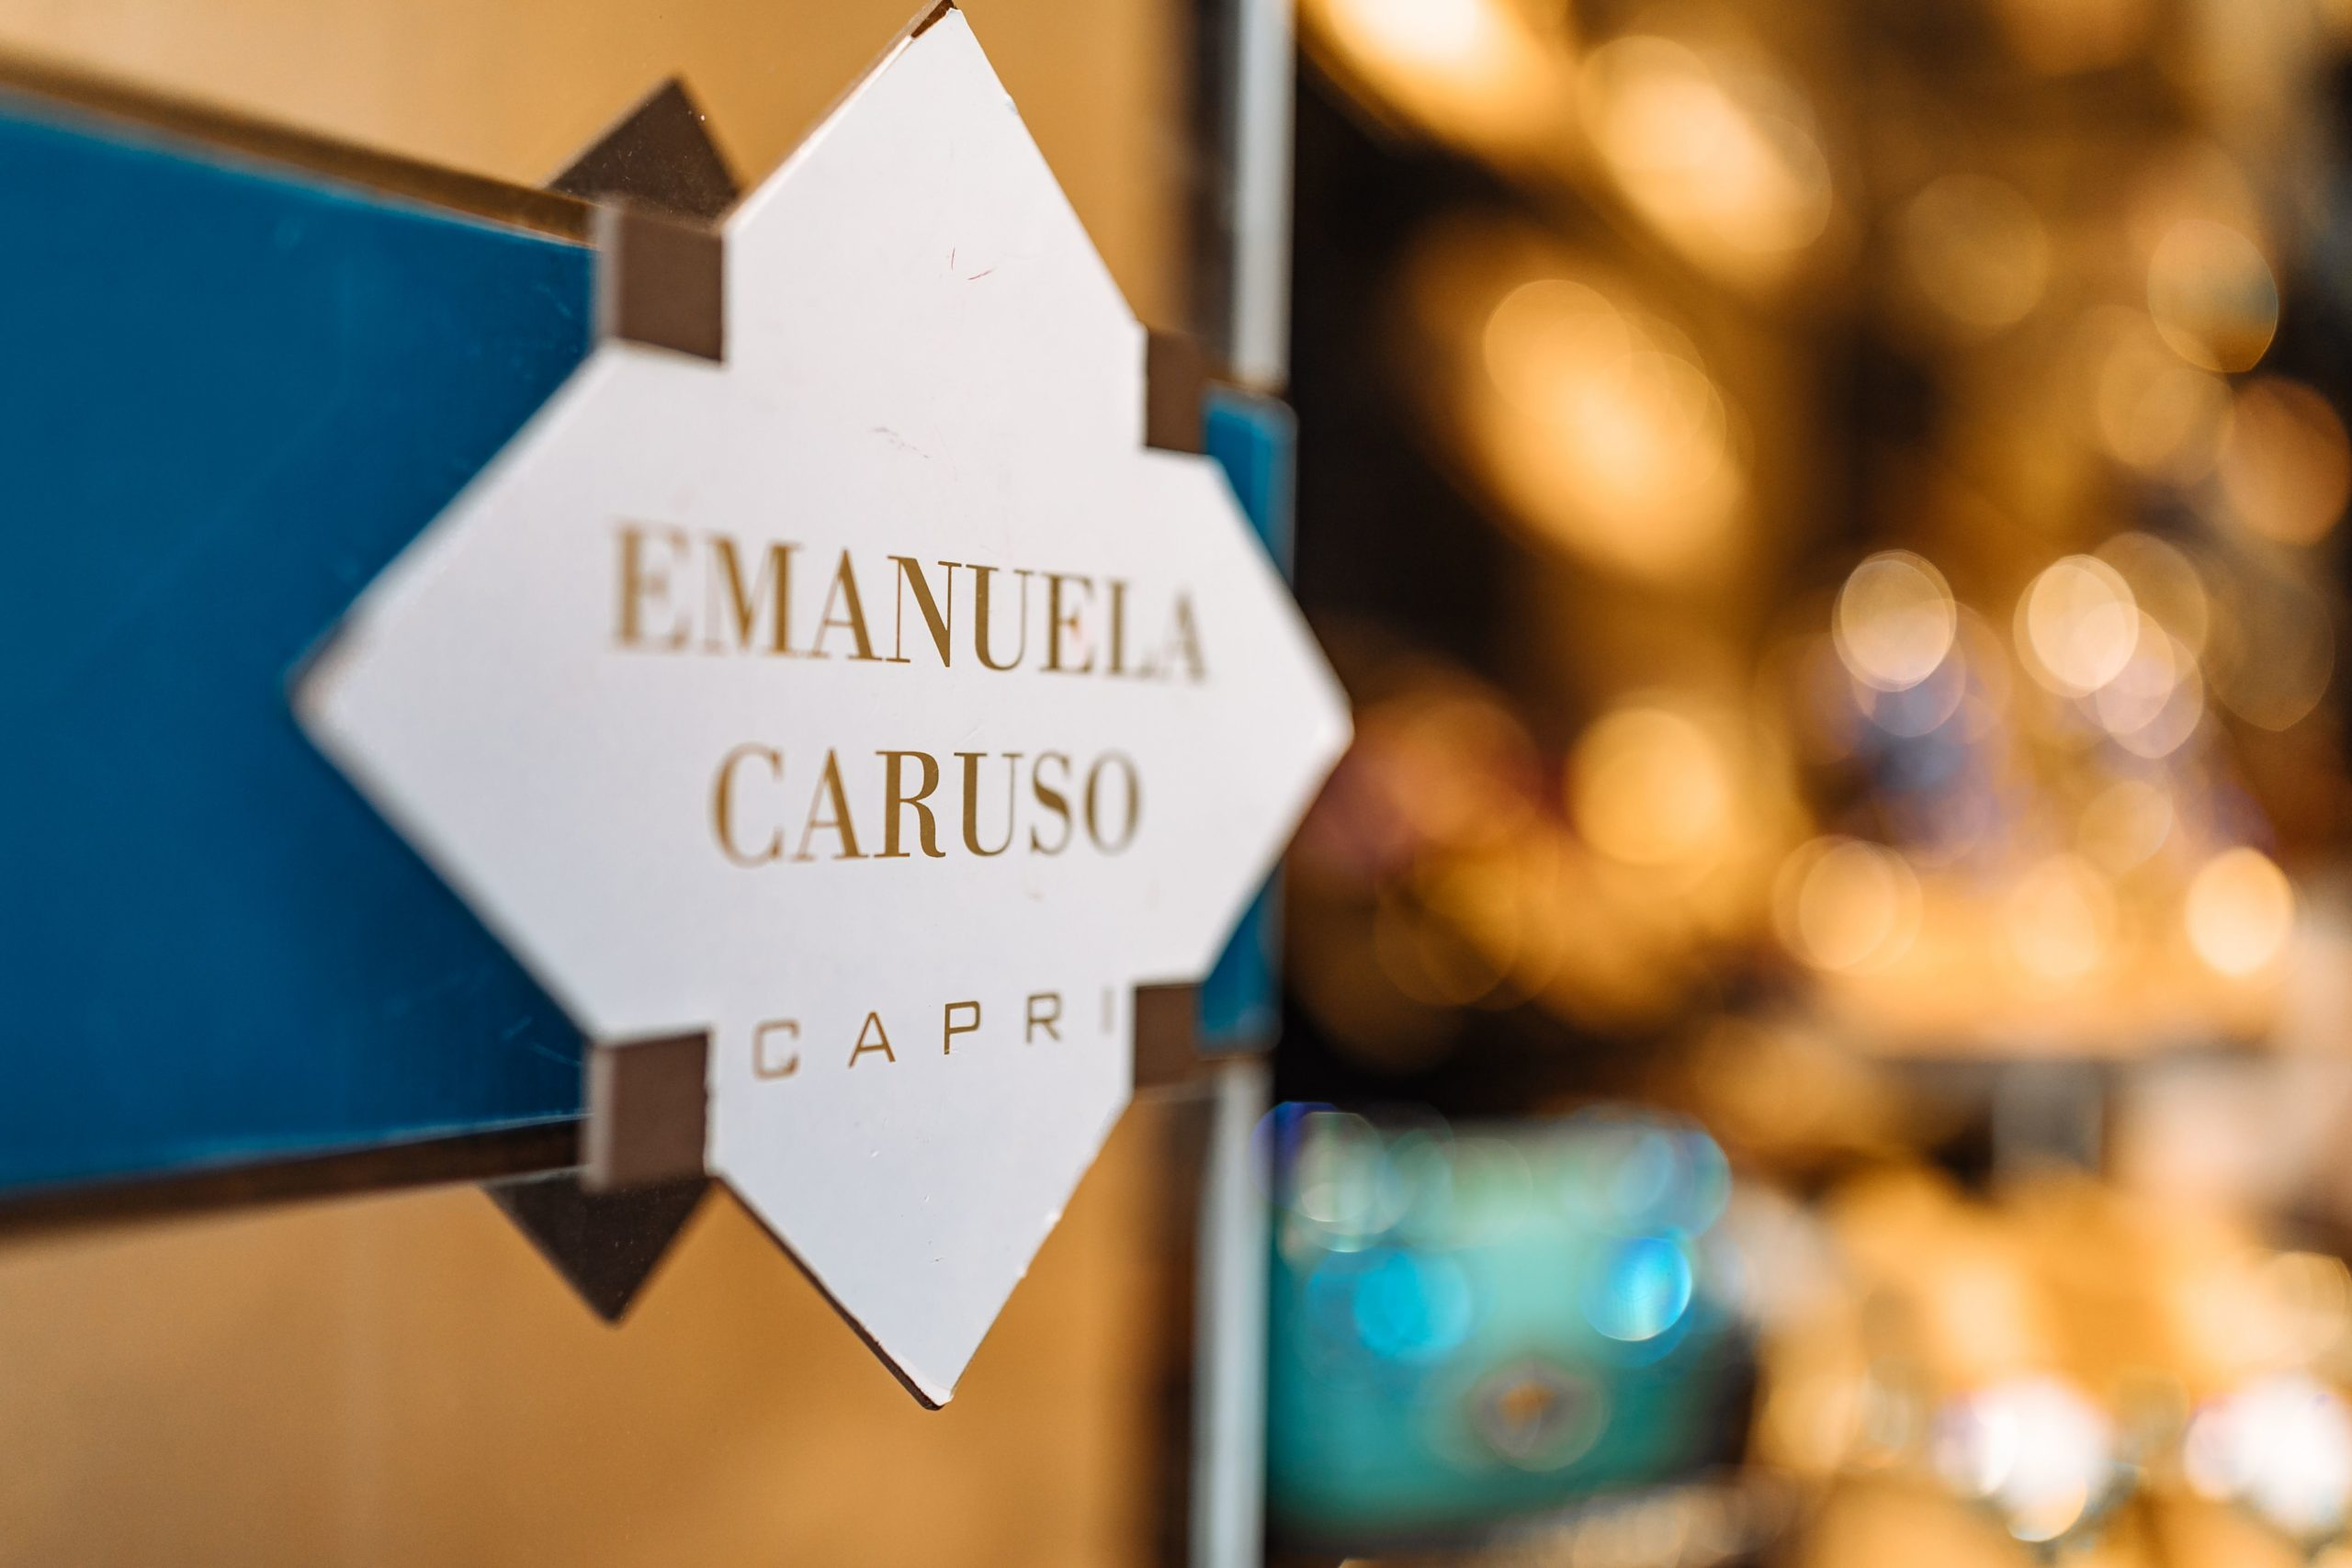 Emanuela Caruso Roma